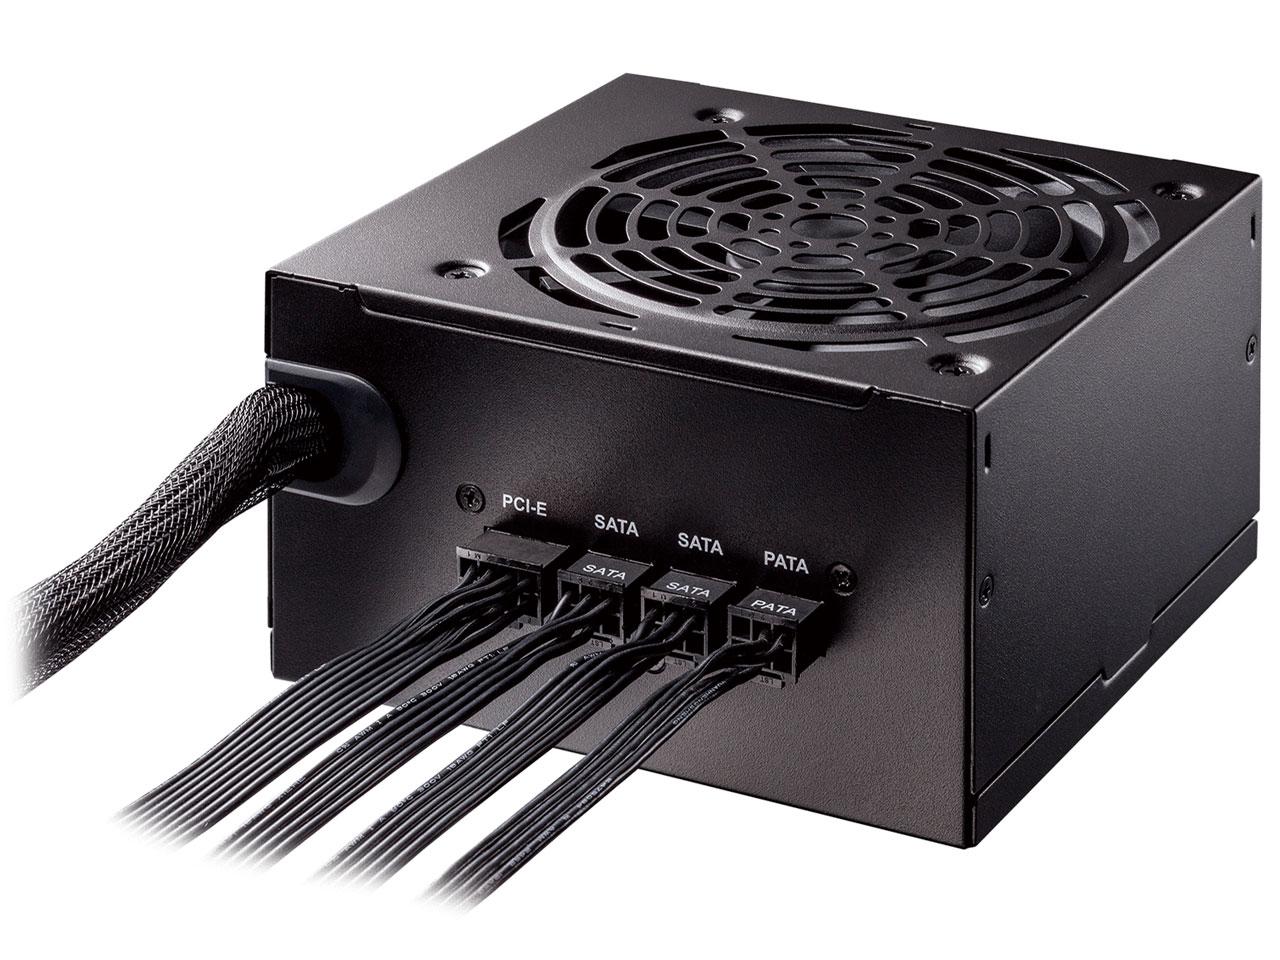 KRPW-BK650W/85+ の製品画像